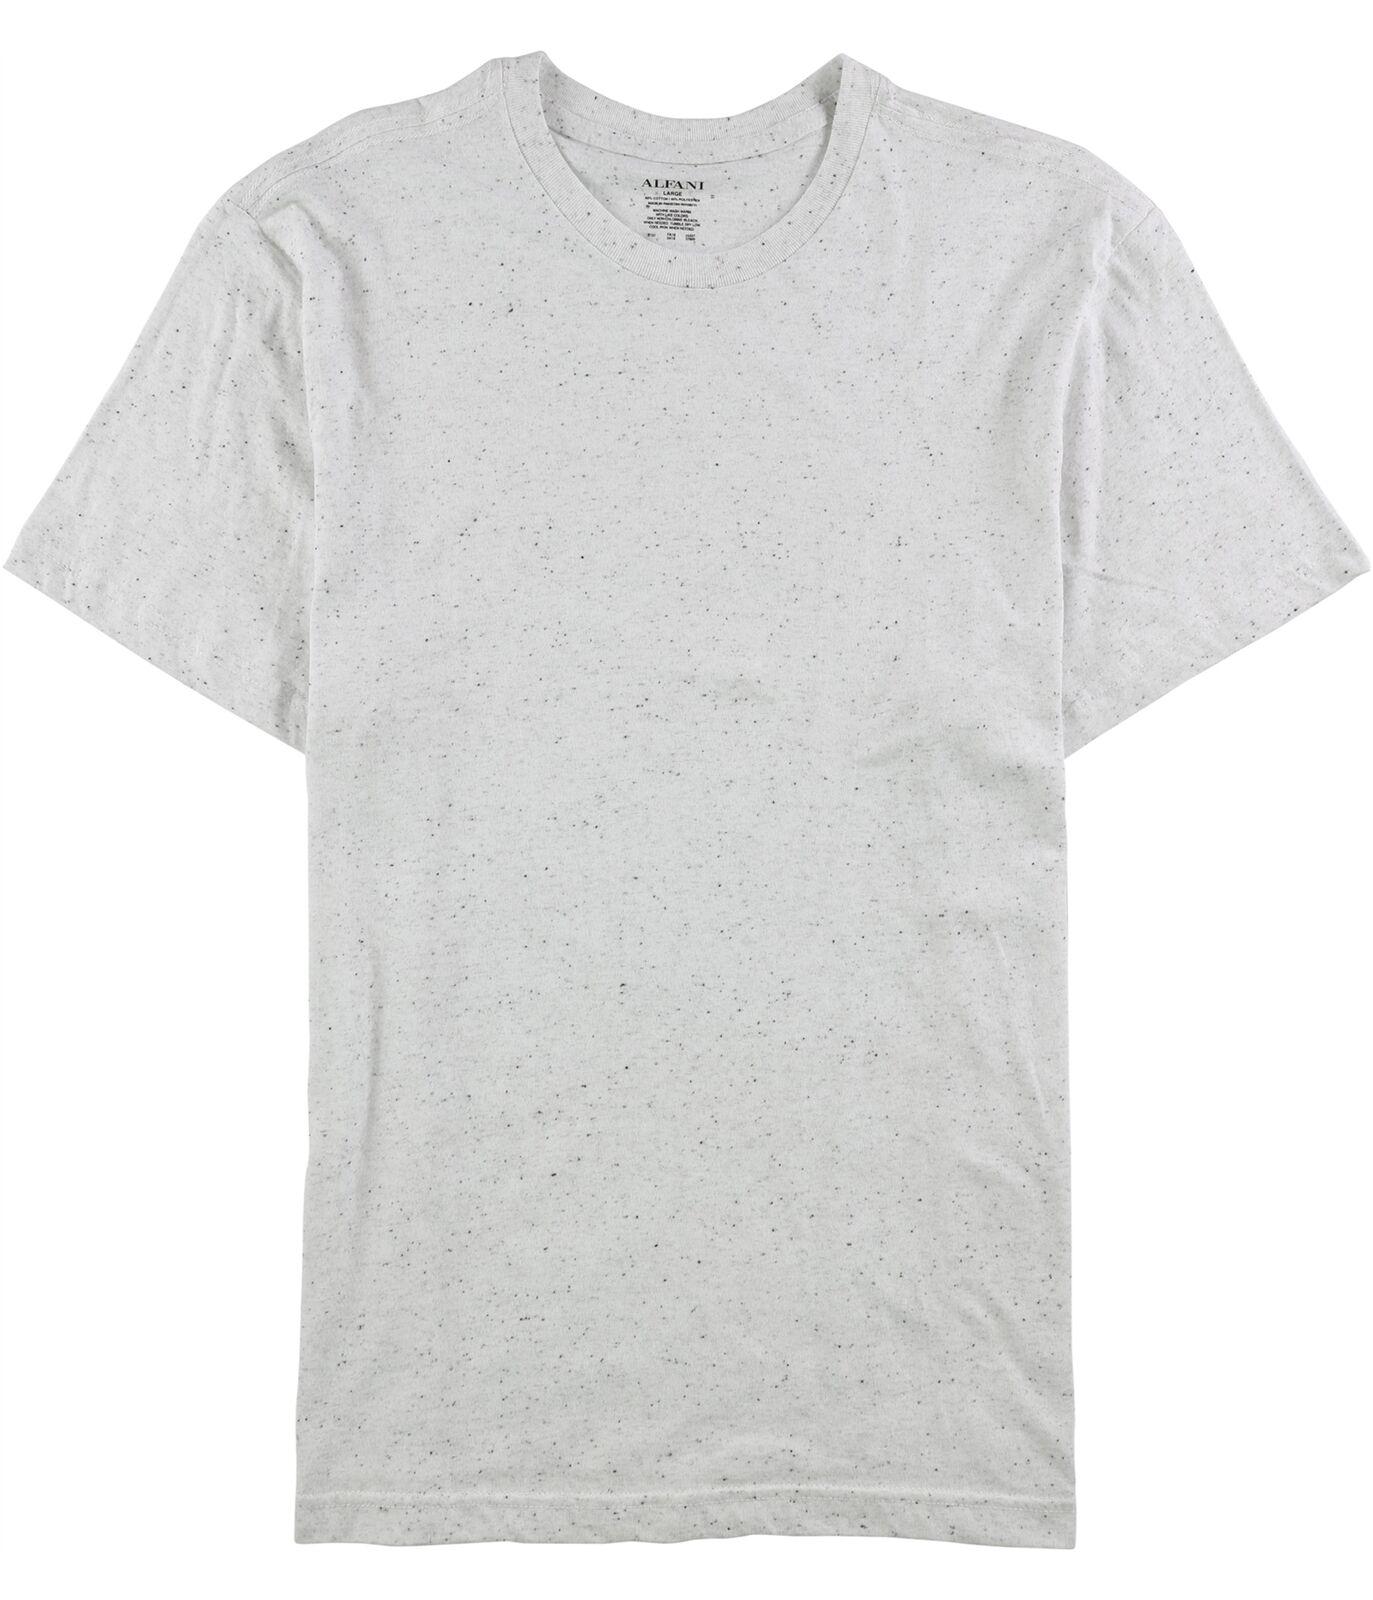 Alfani Mens Speckled Basic T-Shirt